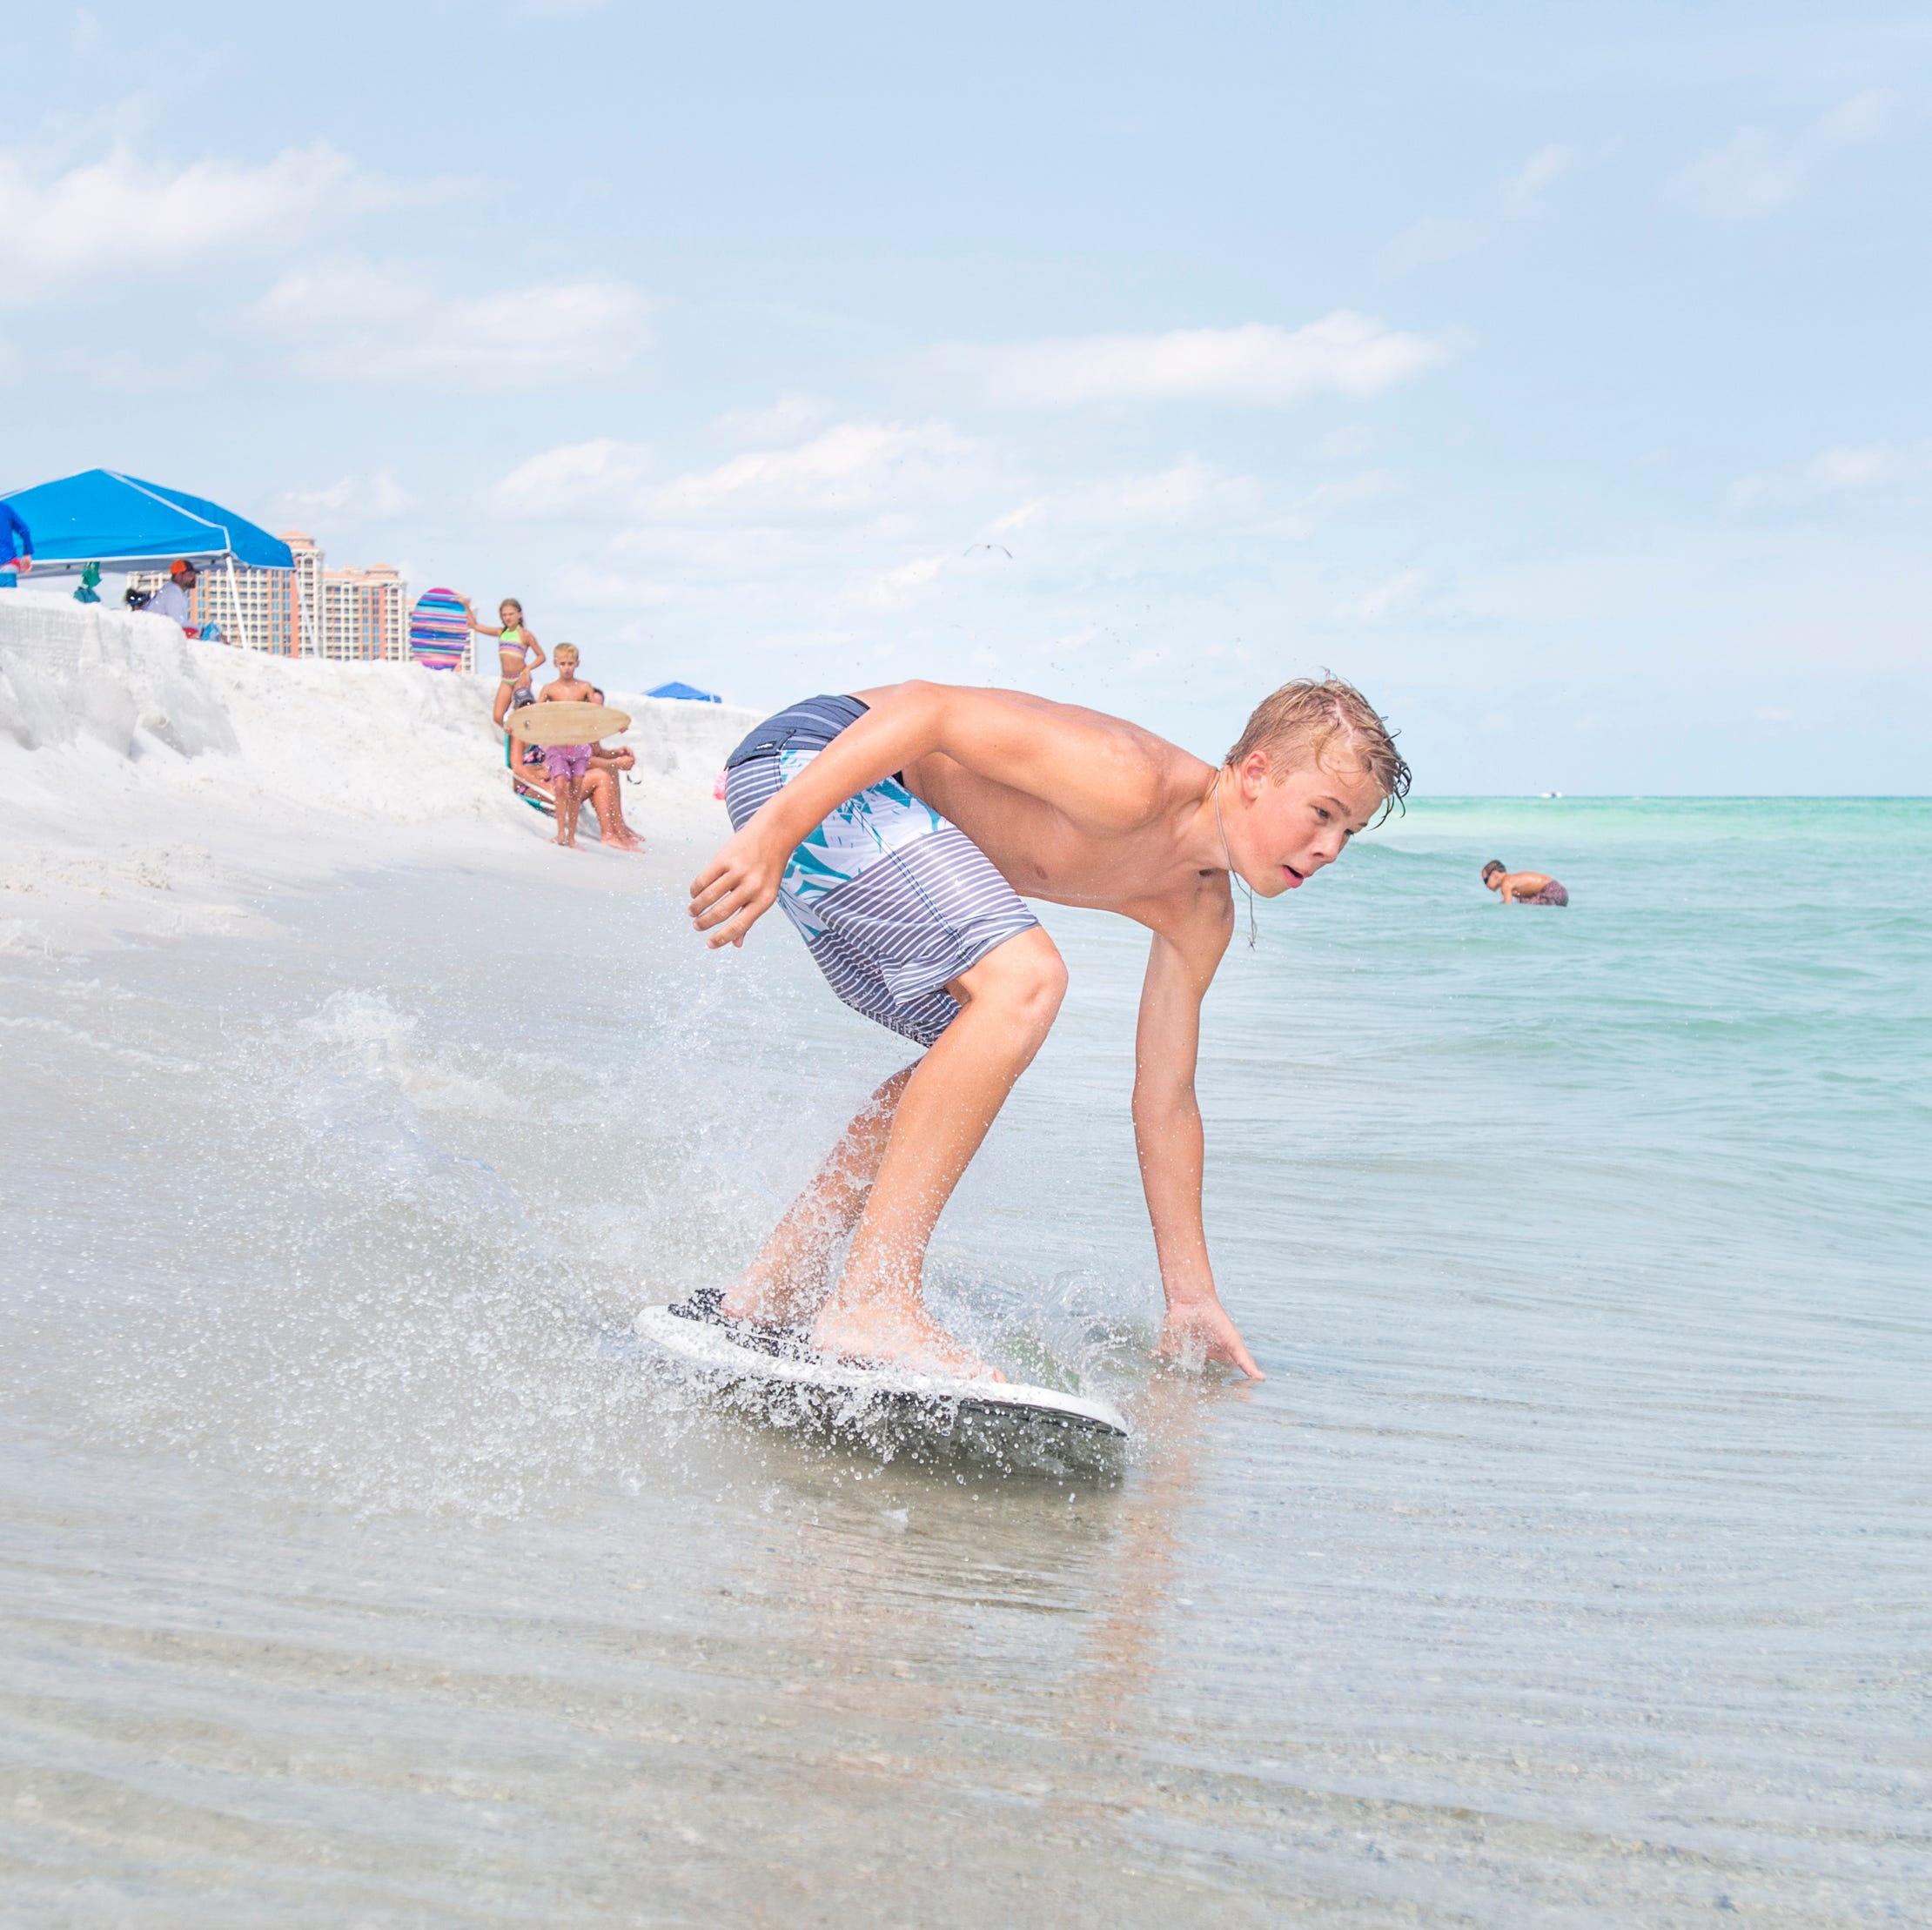 Wyatt West, 14, of New Braunfels, Texas skimboards along Penacola Beach on Friday, July 20, 2018.